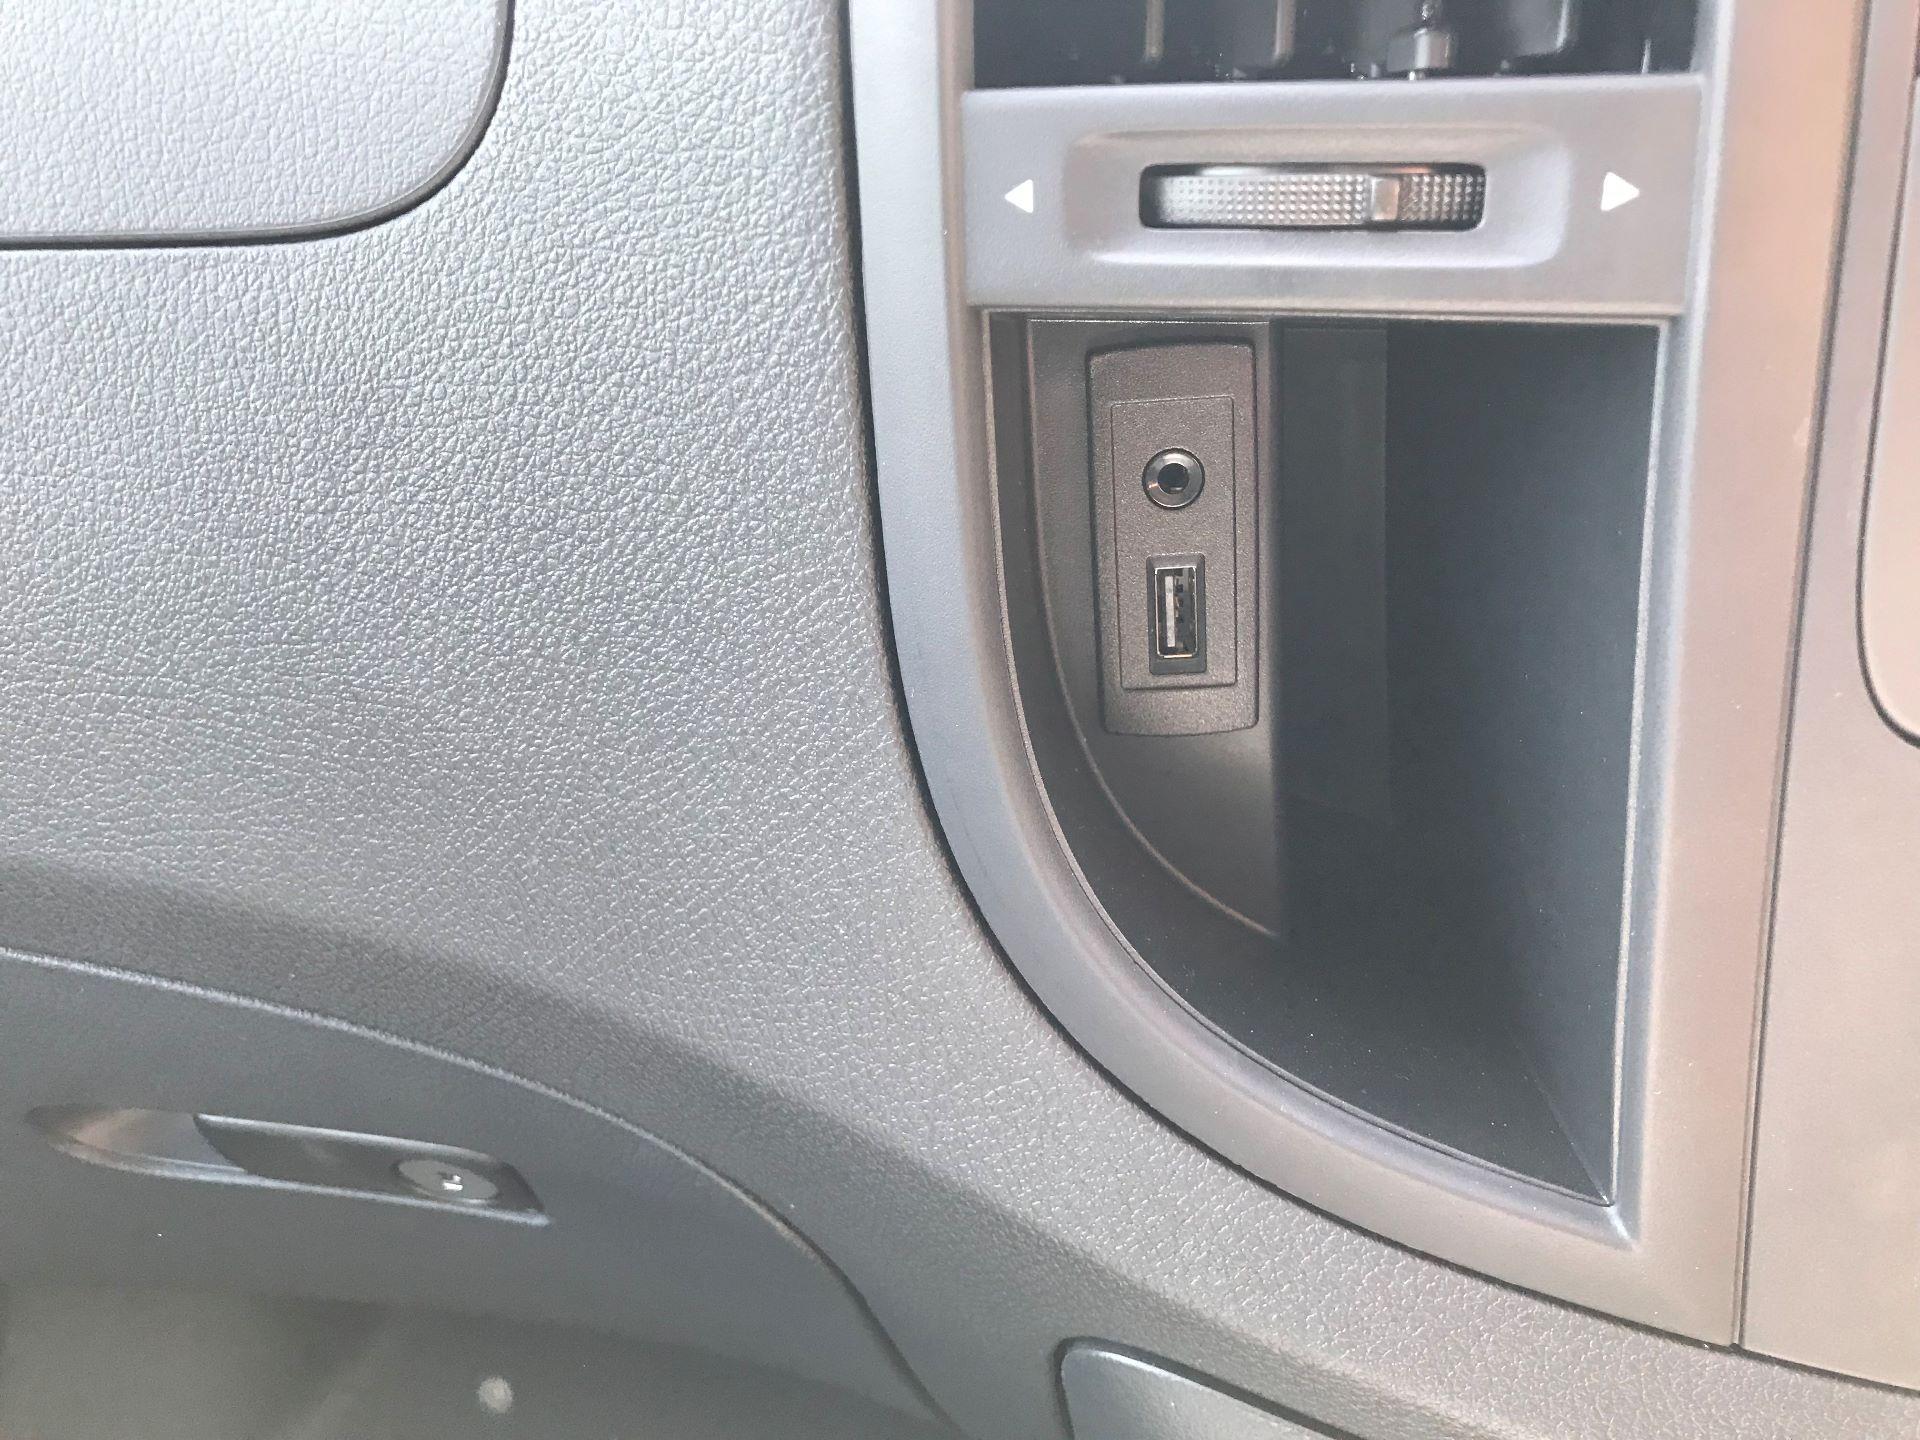 2019 Mercedes-Benz Vito 111Cdi Van Euro 6 Massive specification A/C (YM19FPO) Image 17